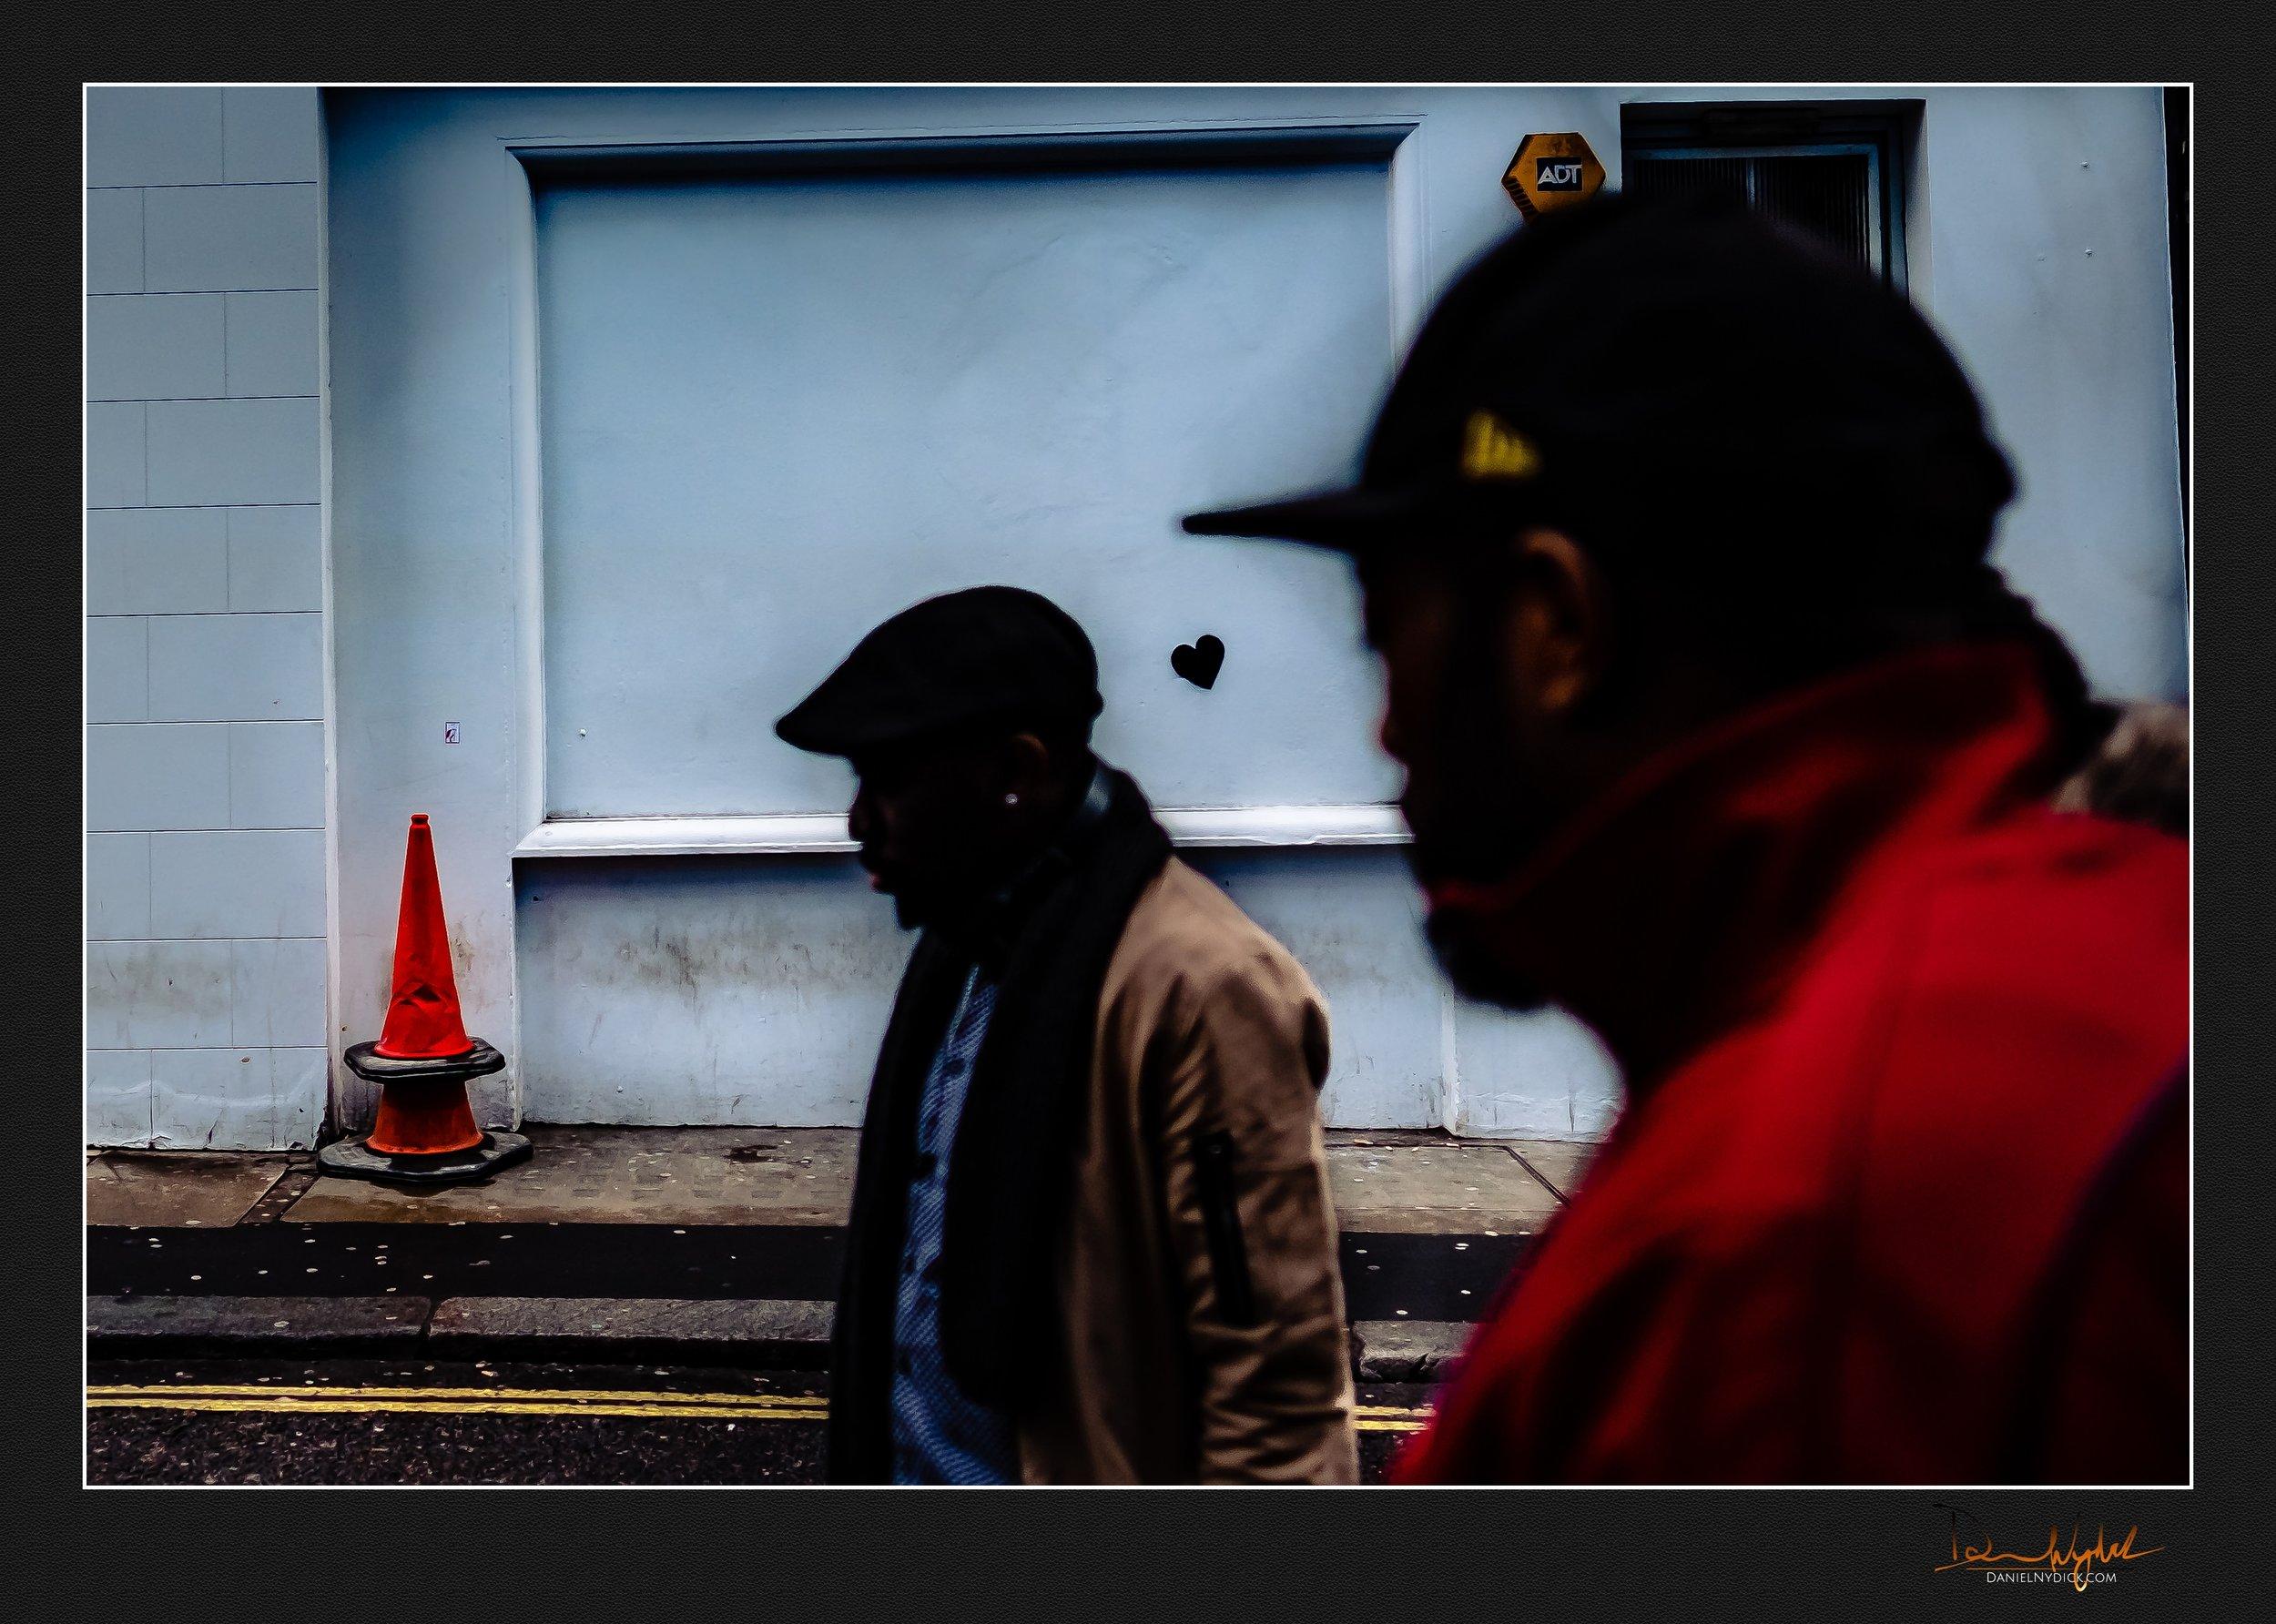 hearts, silhouette, people, street